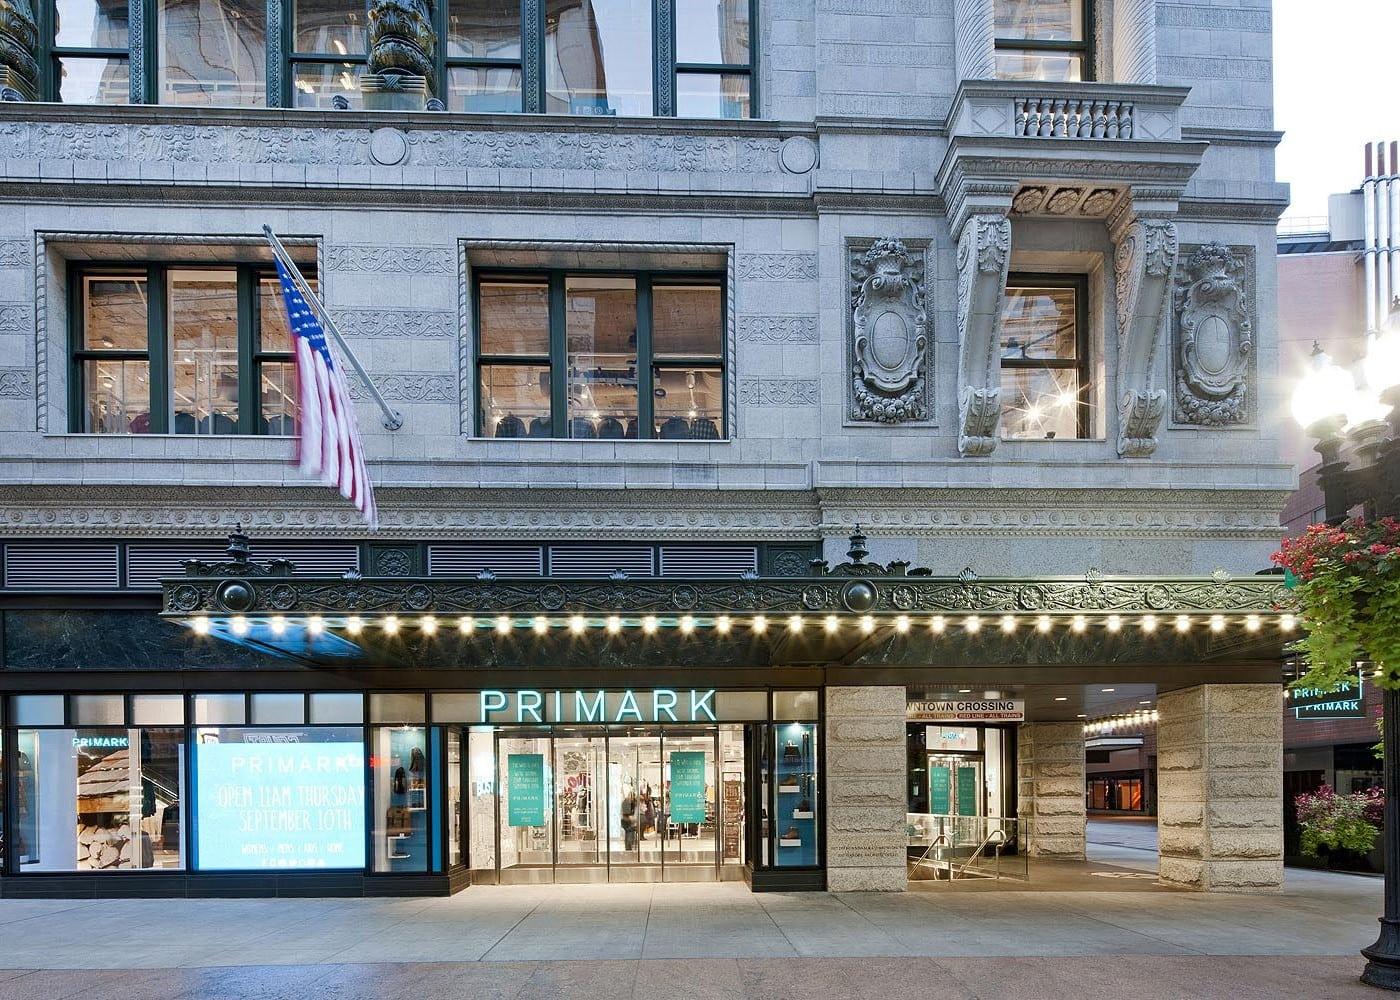 retail lighting design: Primark exterior street view